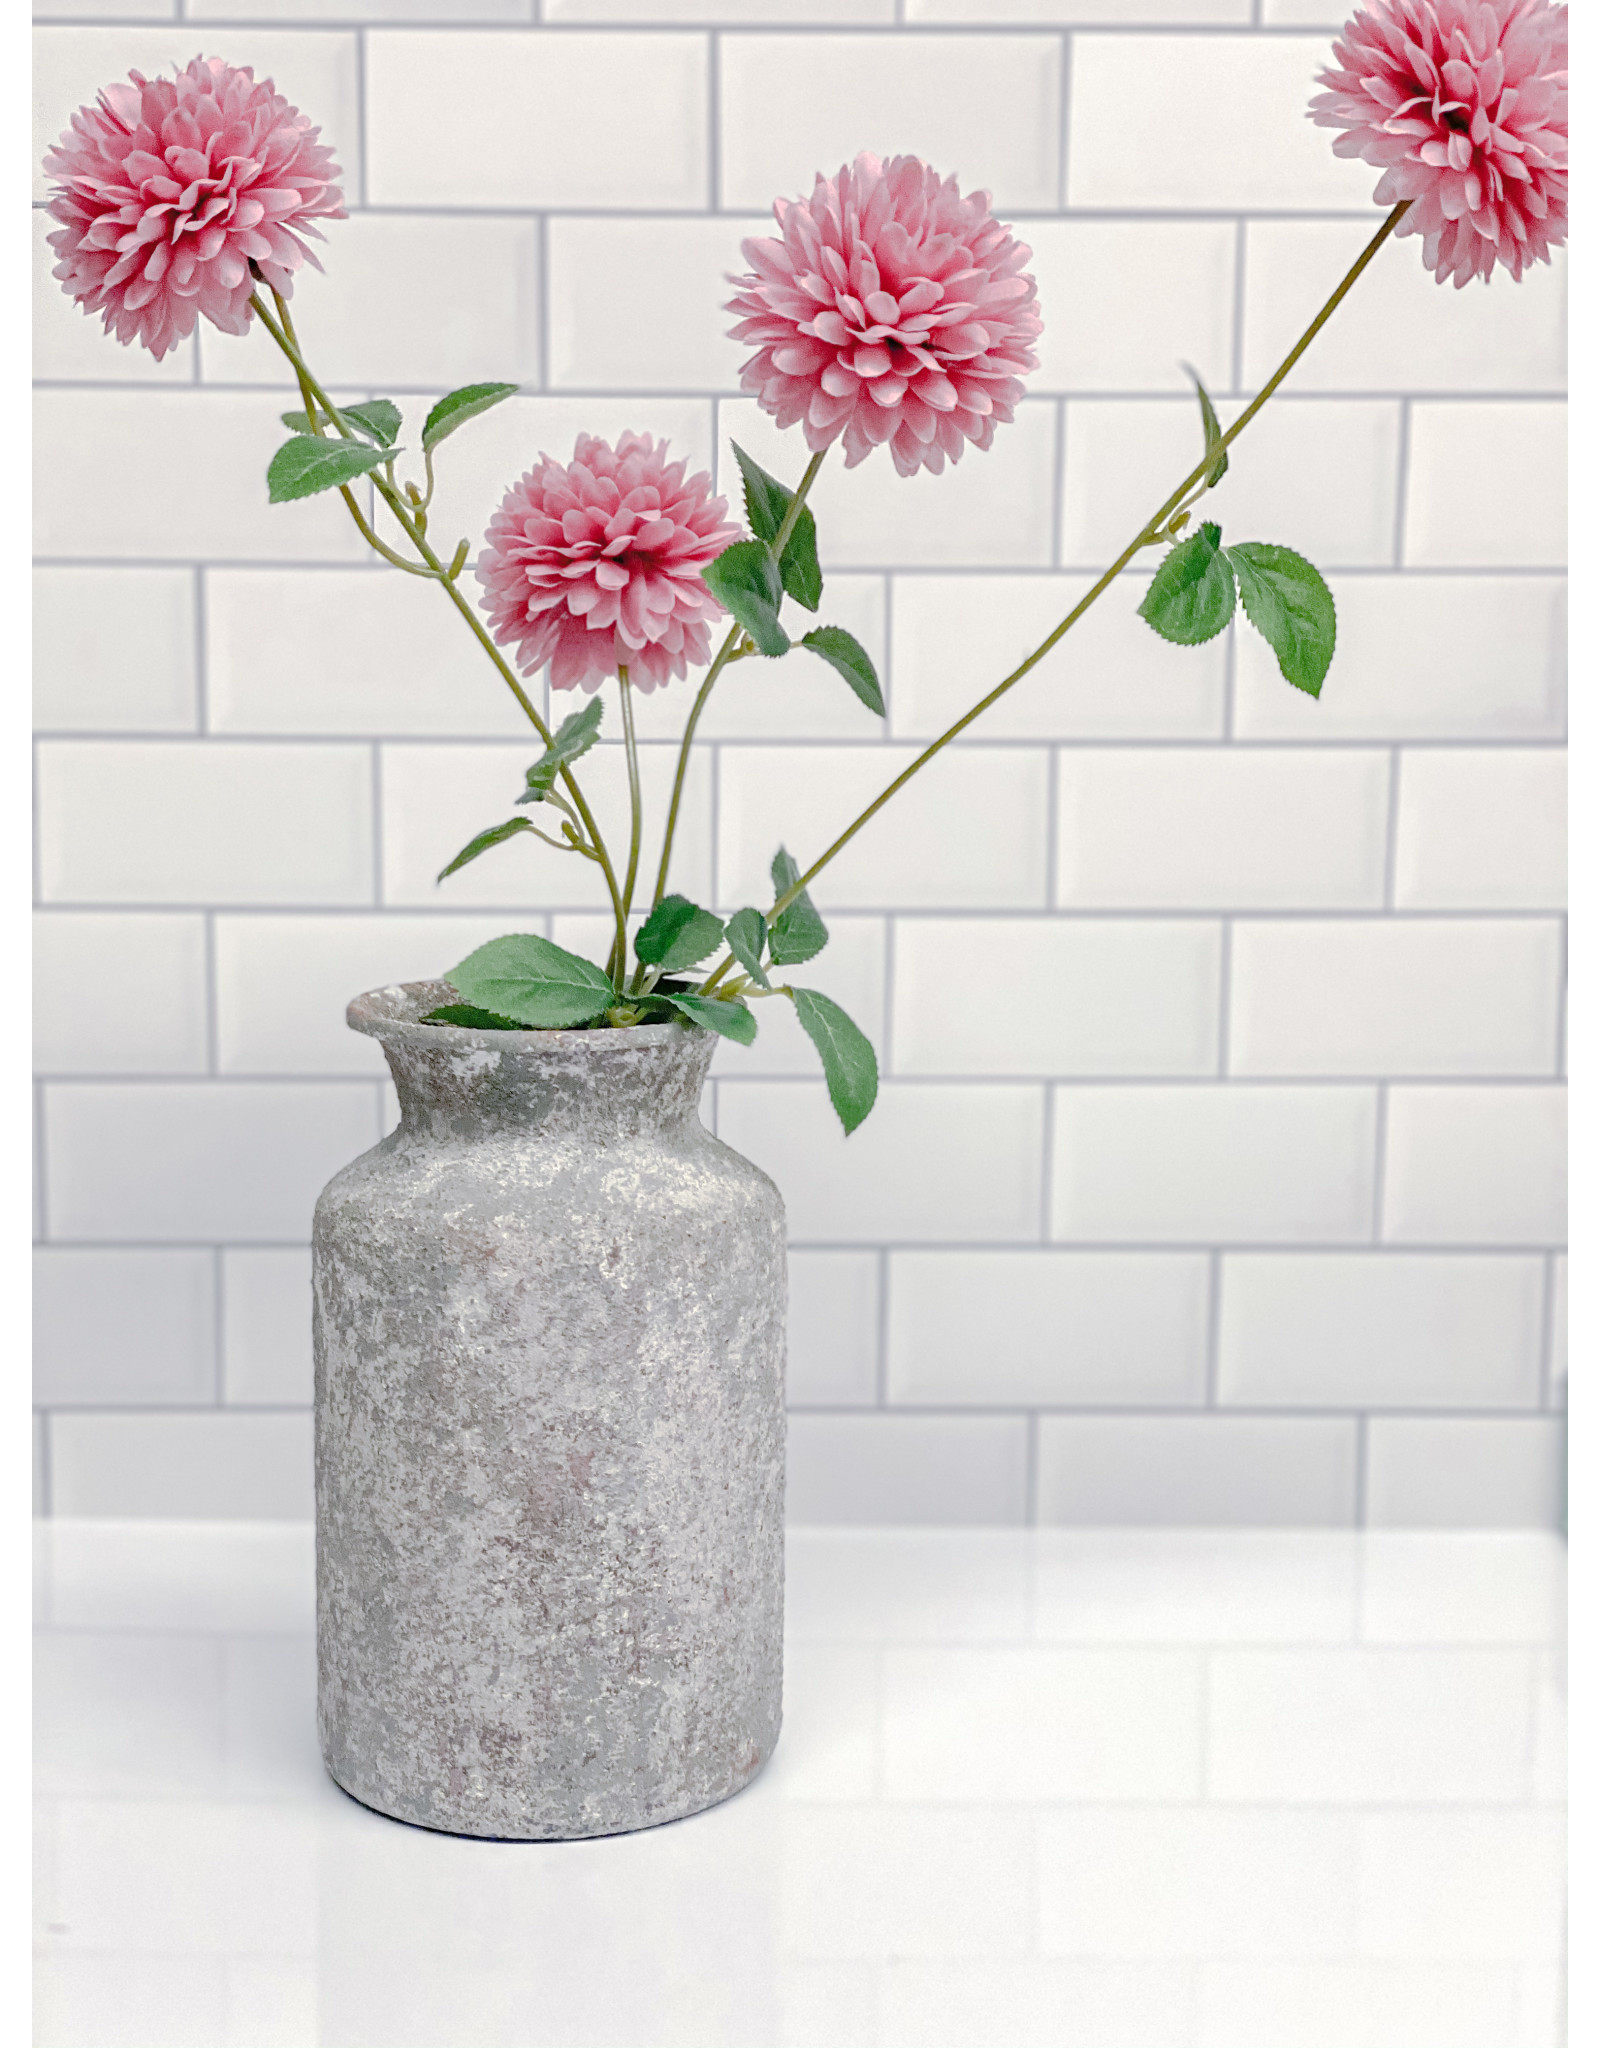 The Florist & The Merchant Pink Small Mum Floral Stem